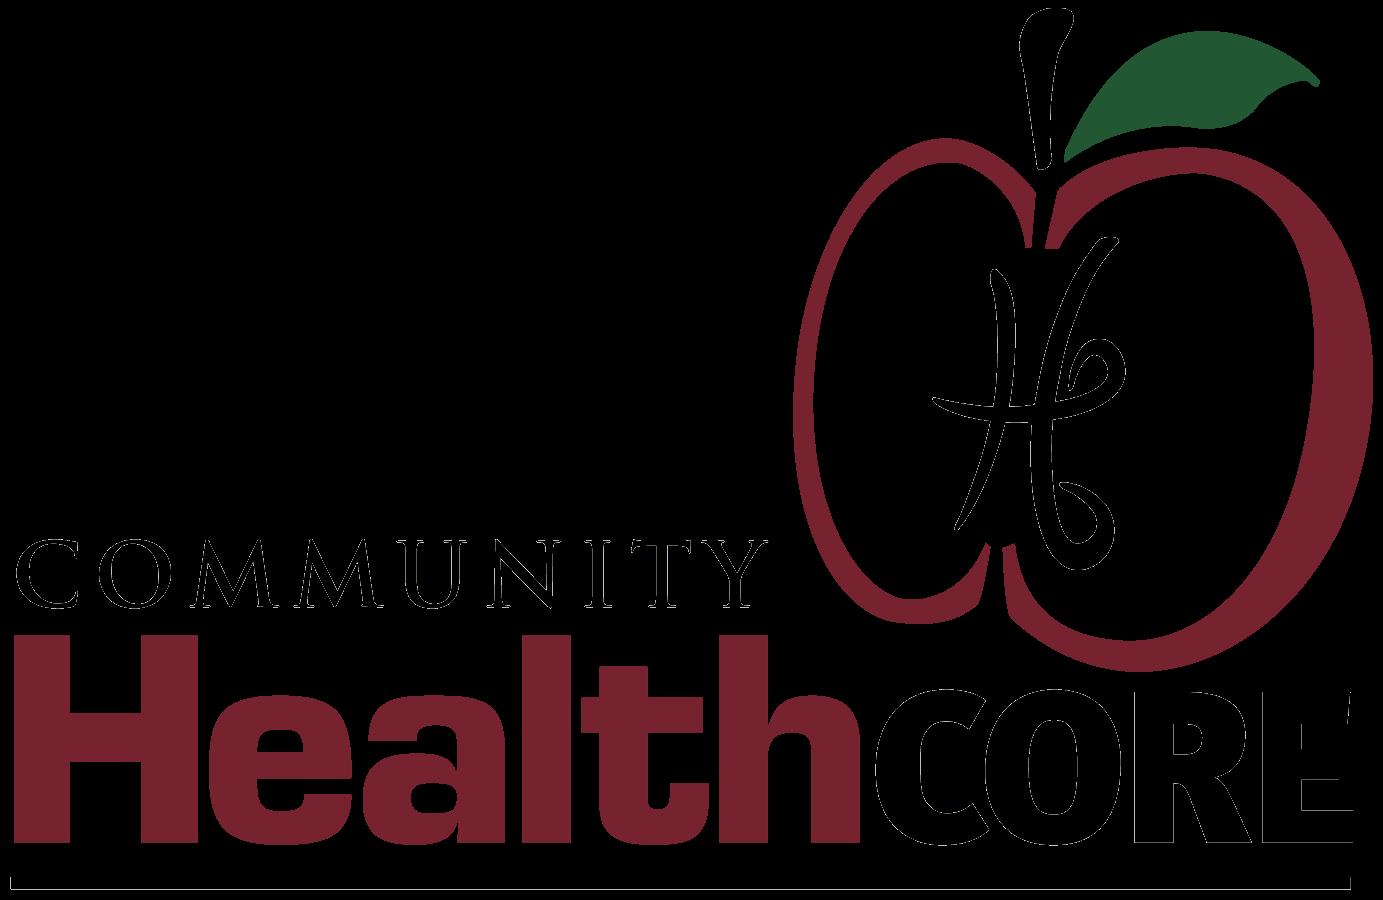 Community Healthcore Logo